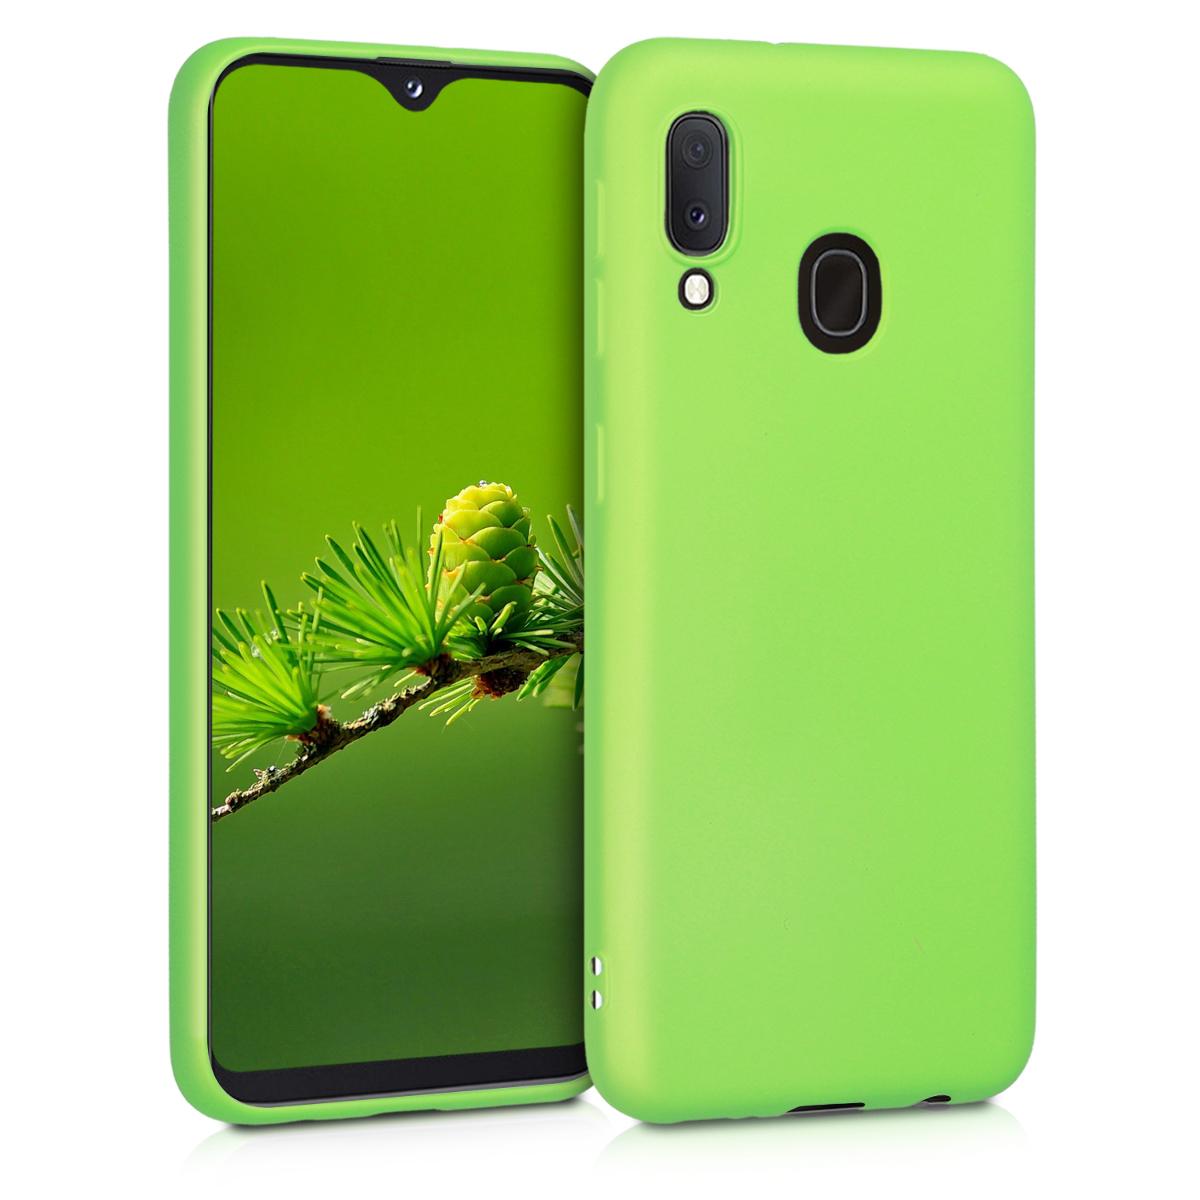 KW Θήκη Σιλικόνης Samsung Galaxy A20e - Metallic Light Green (48739.90)